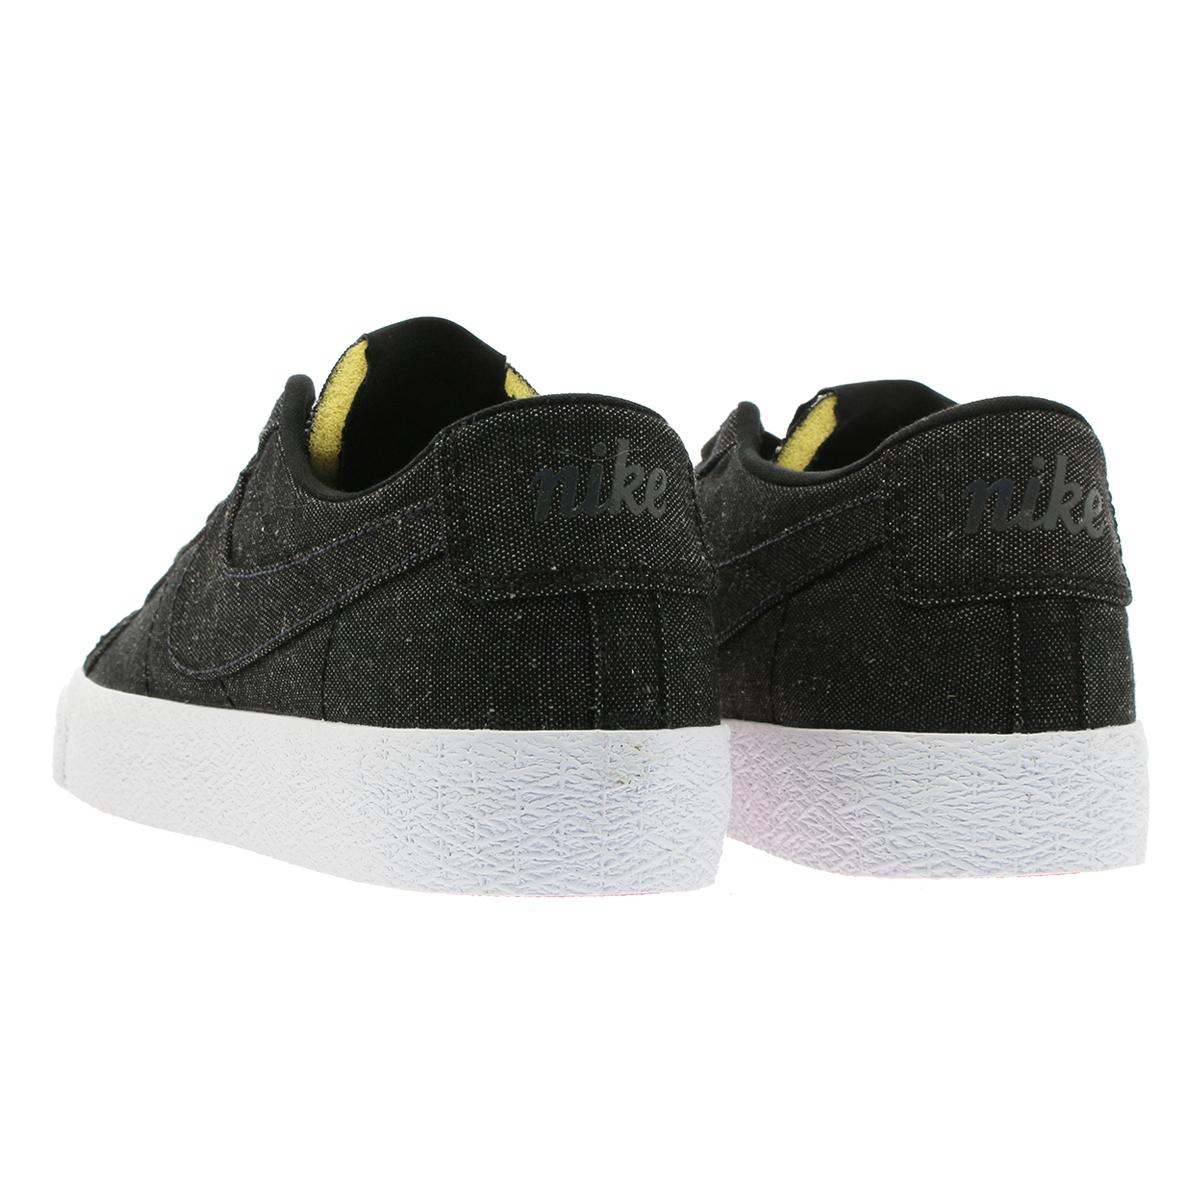 buy online 5d8e2 28be3 ... NIKE SB BLAZER ZOOM LOW CANVAS DECONSTRUCTED Nike SB zoom blazer low  canvas deacon strike comfortable ...